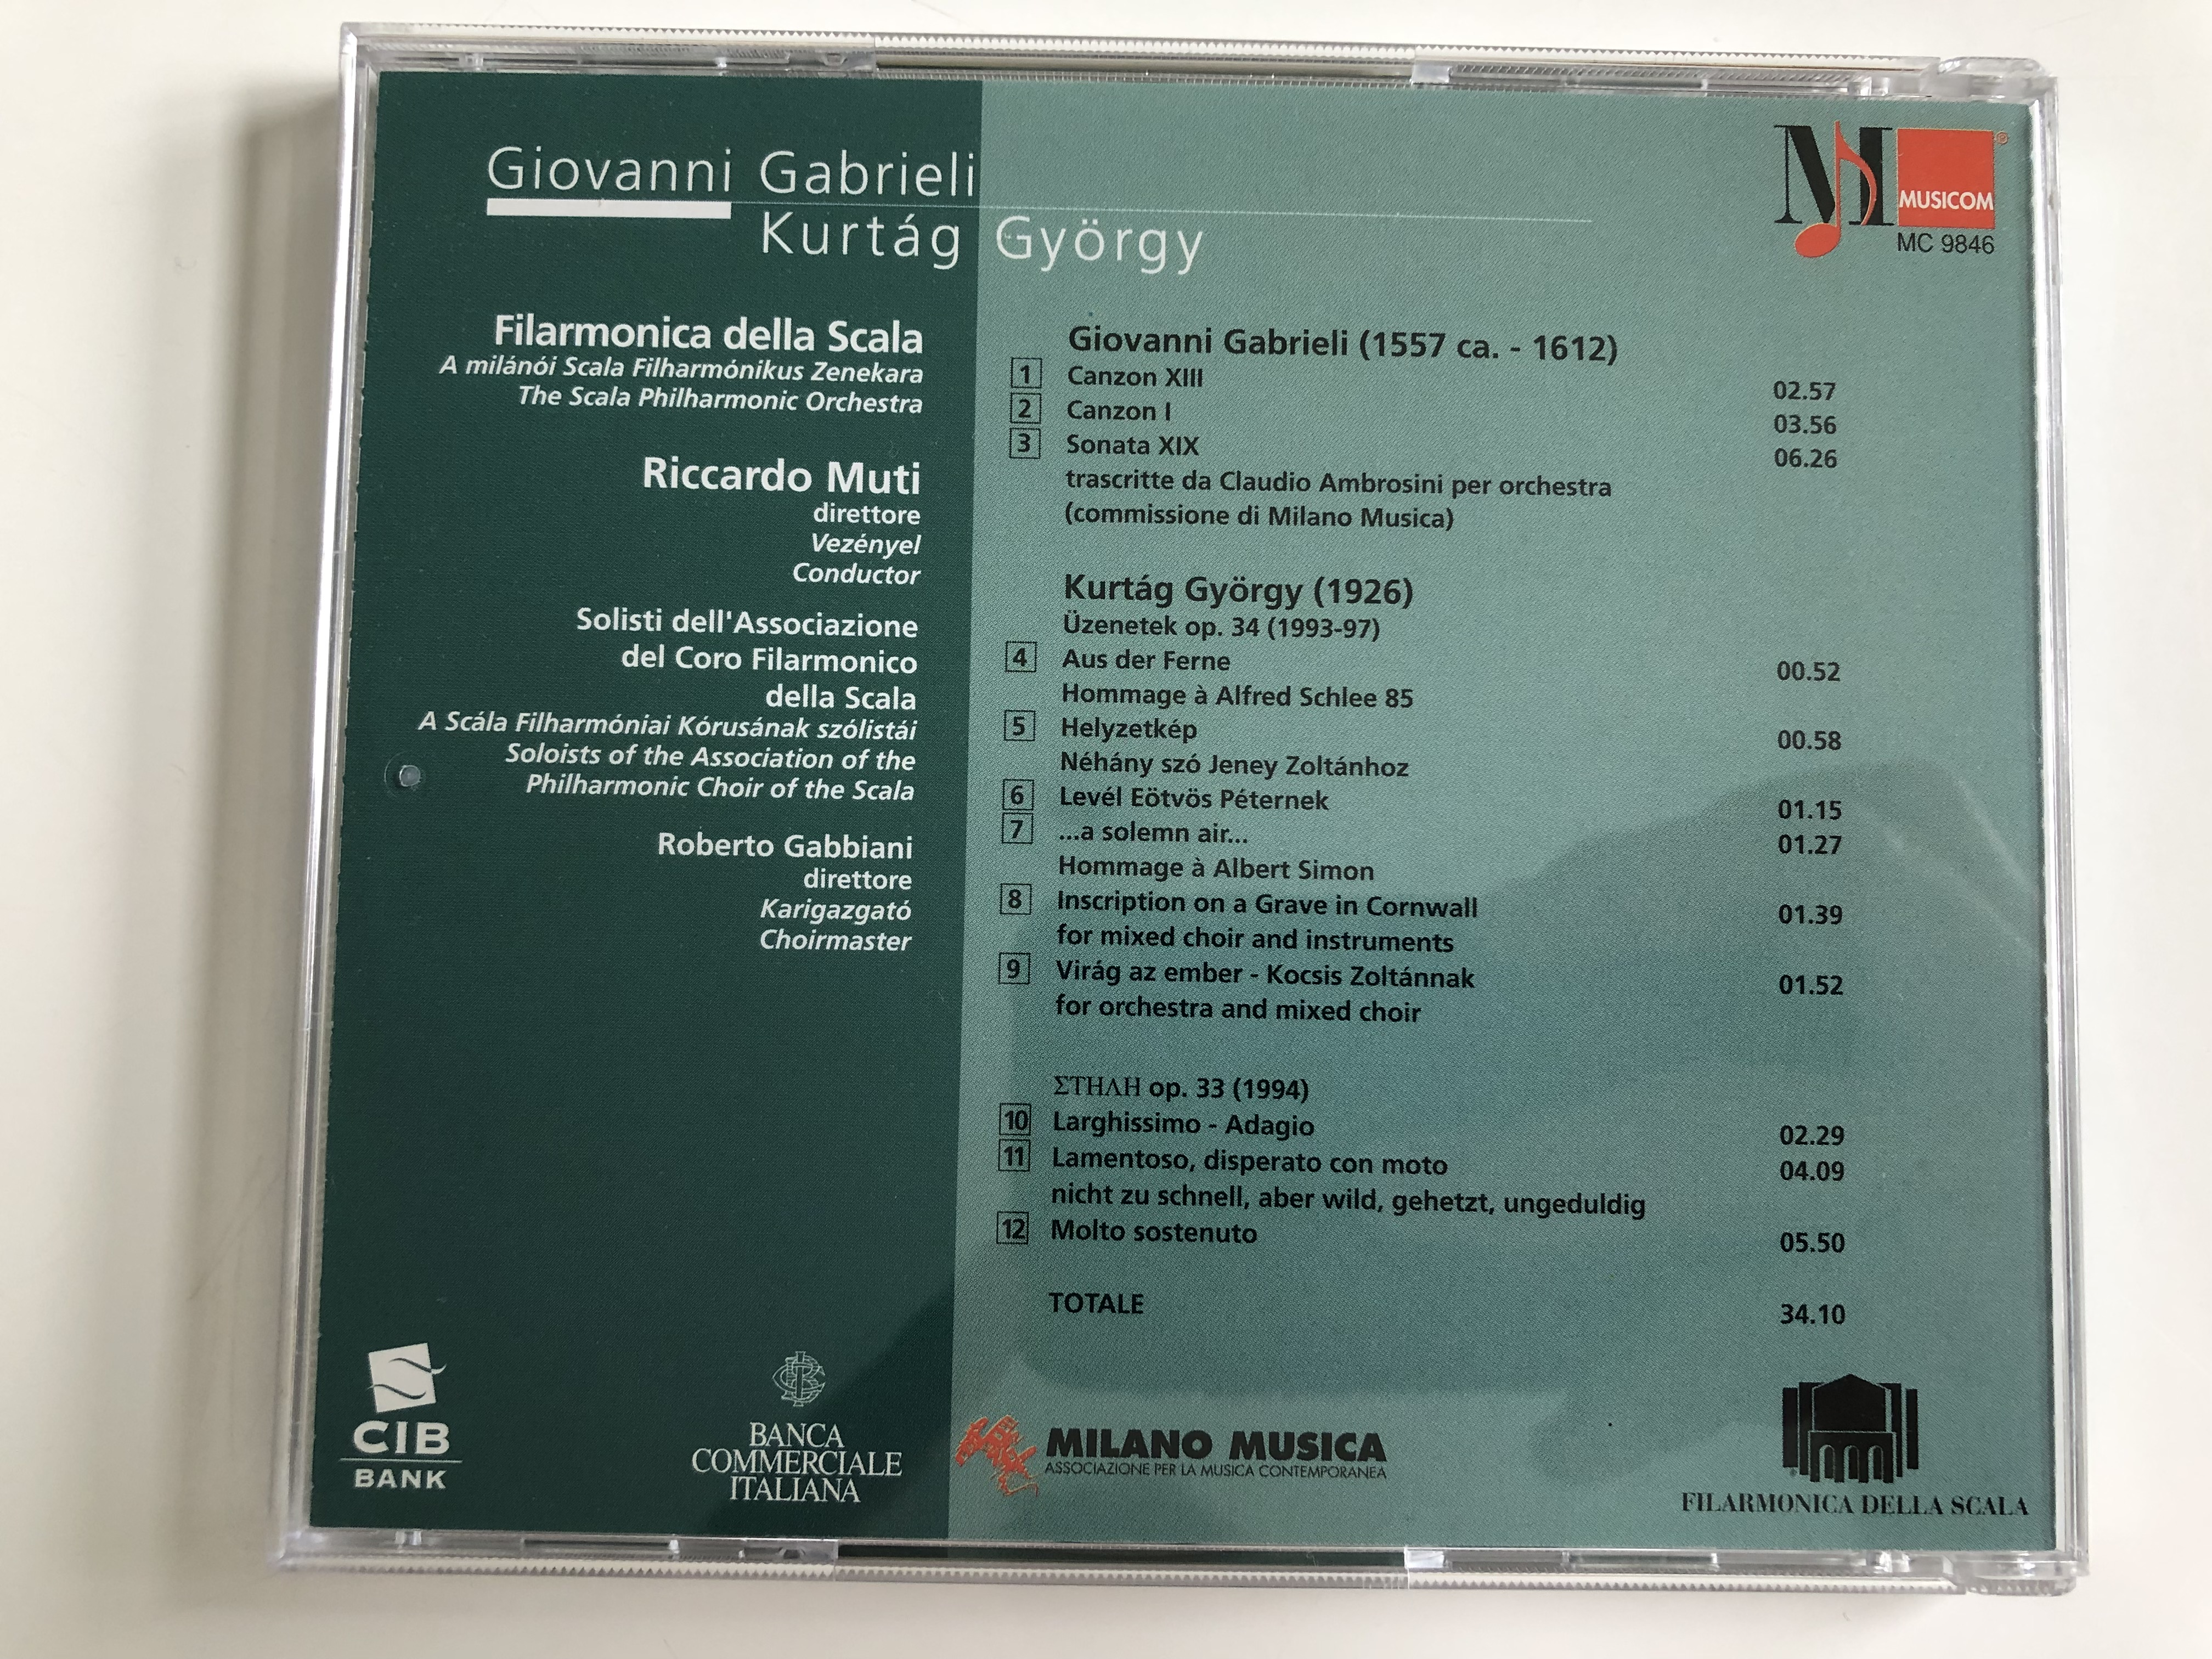 milano-musica-festival-gy-rgy-kurt-g-giovanni-gabrieli-kurt-g-gy-rgy-riccardo-muti-filarmonica-della-scala-musicom-audio-cd-1998-stereo-mc-9846-13-.jpg